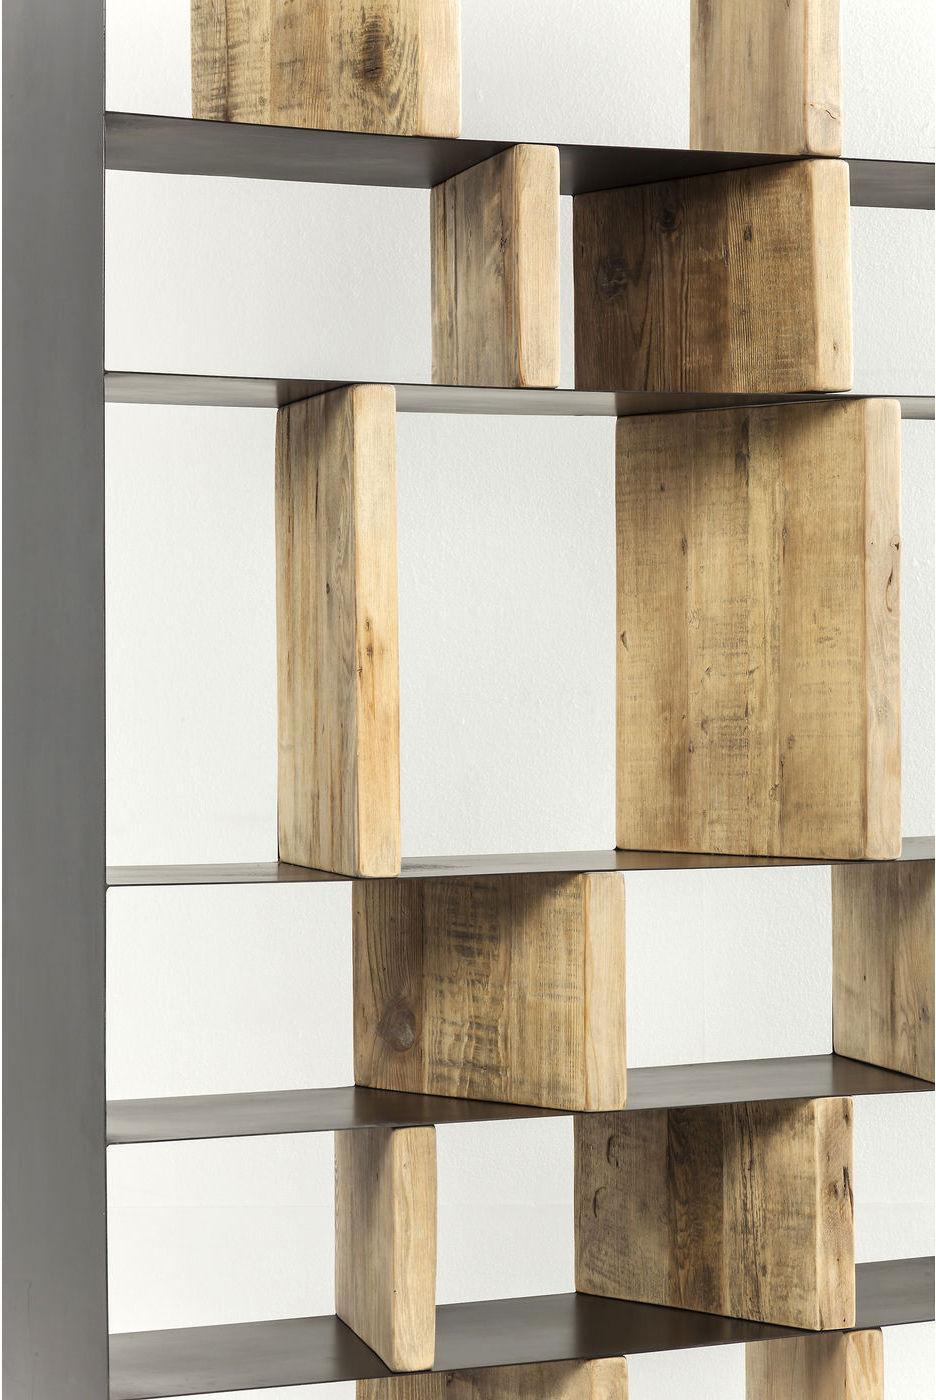 Kare Design Boekenkast Storm H234cm - Designwonen.com | Meubelen ...